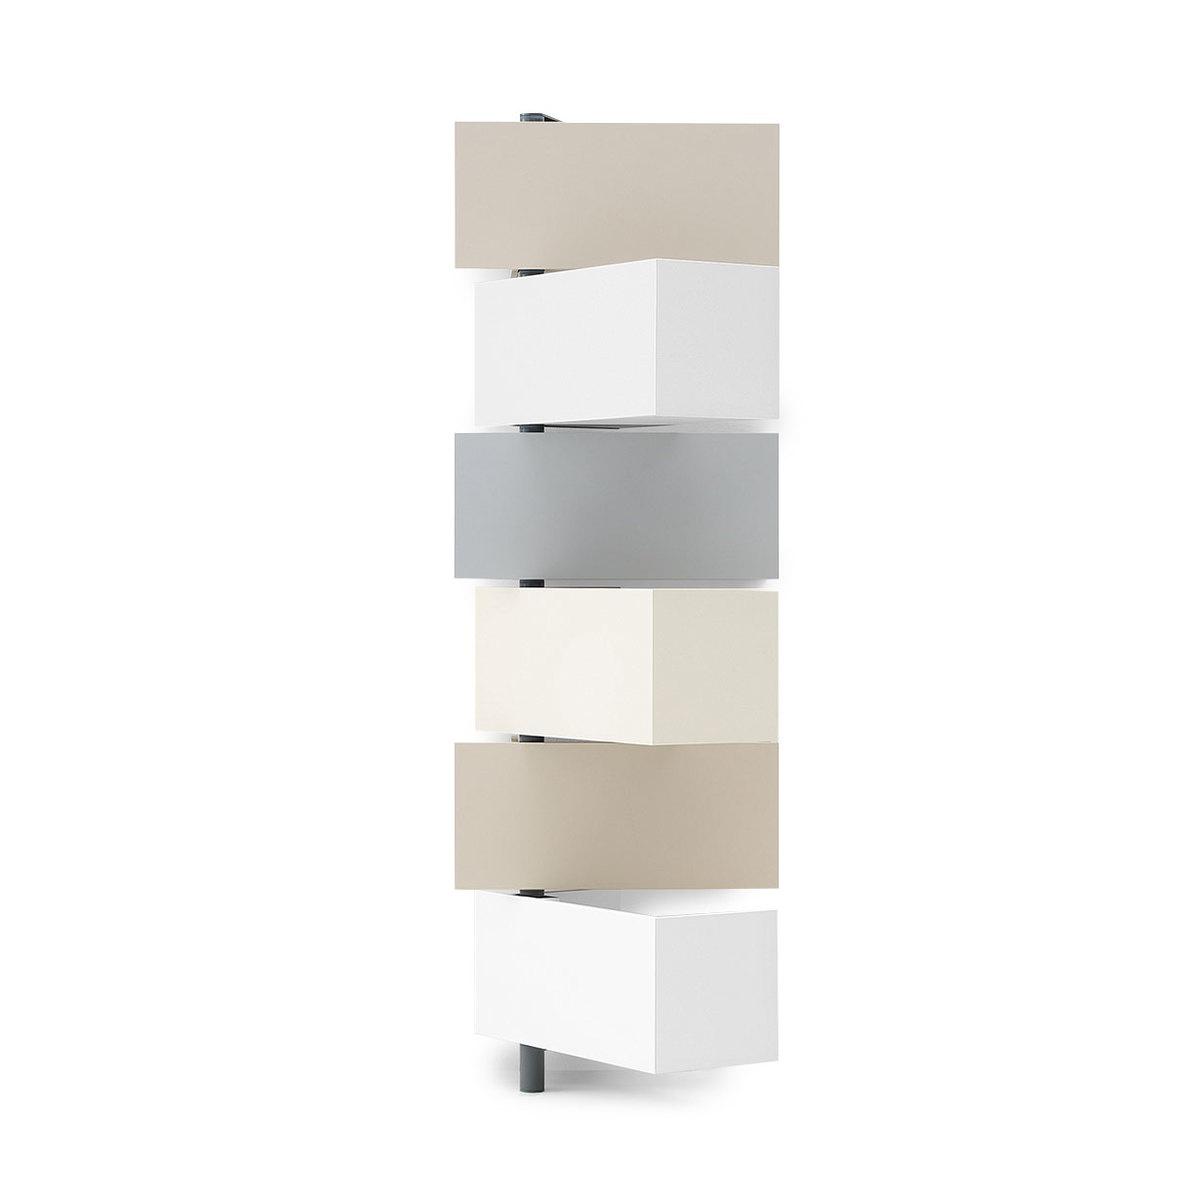 meuble de rangement giralot by sculptures jeux lovethesign. Black Bedroom Furniture Sets. Home Design Ideas